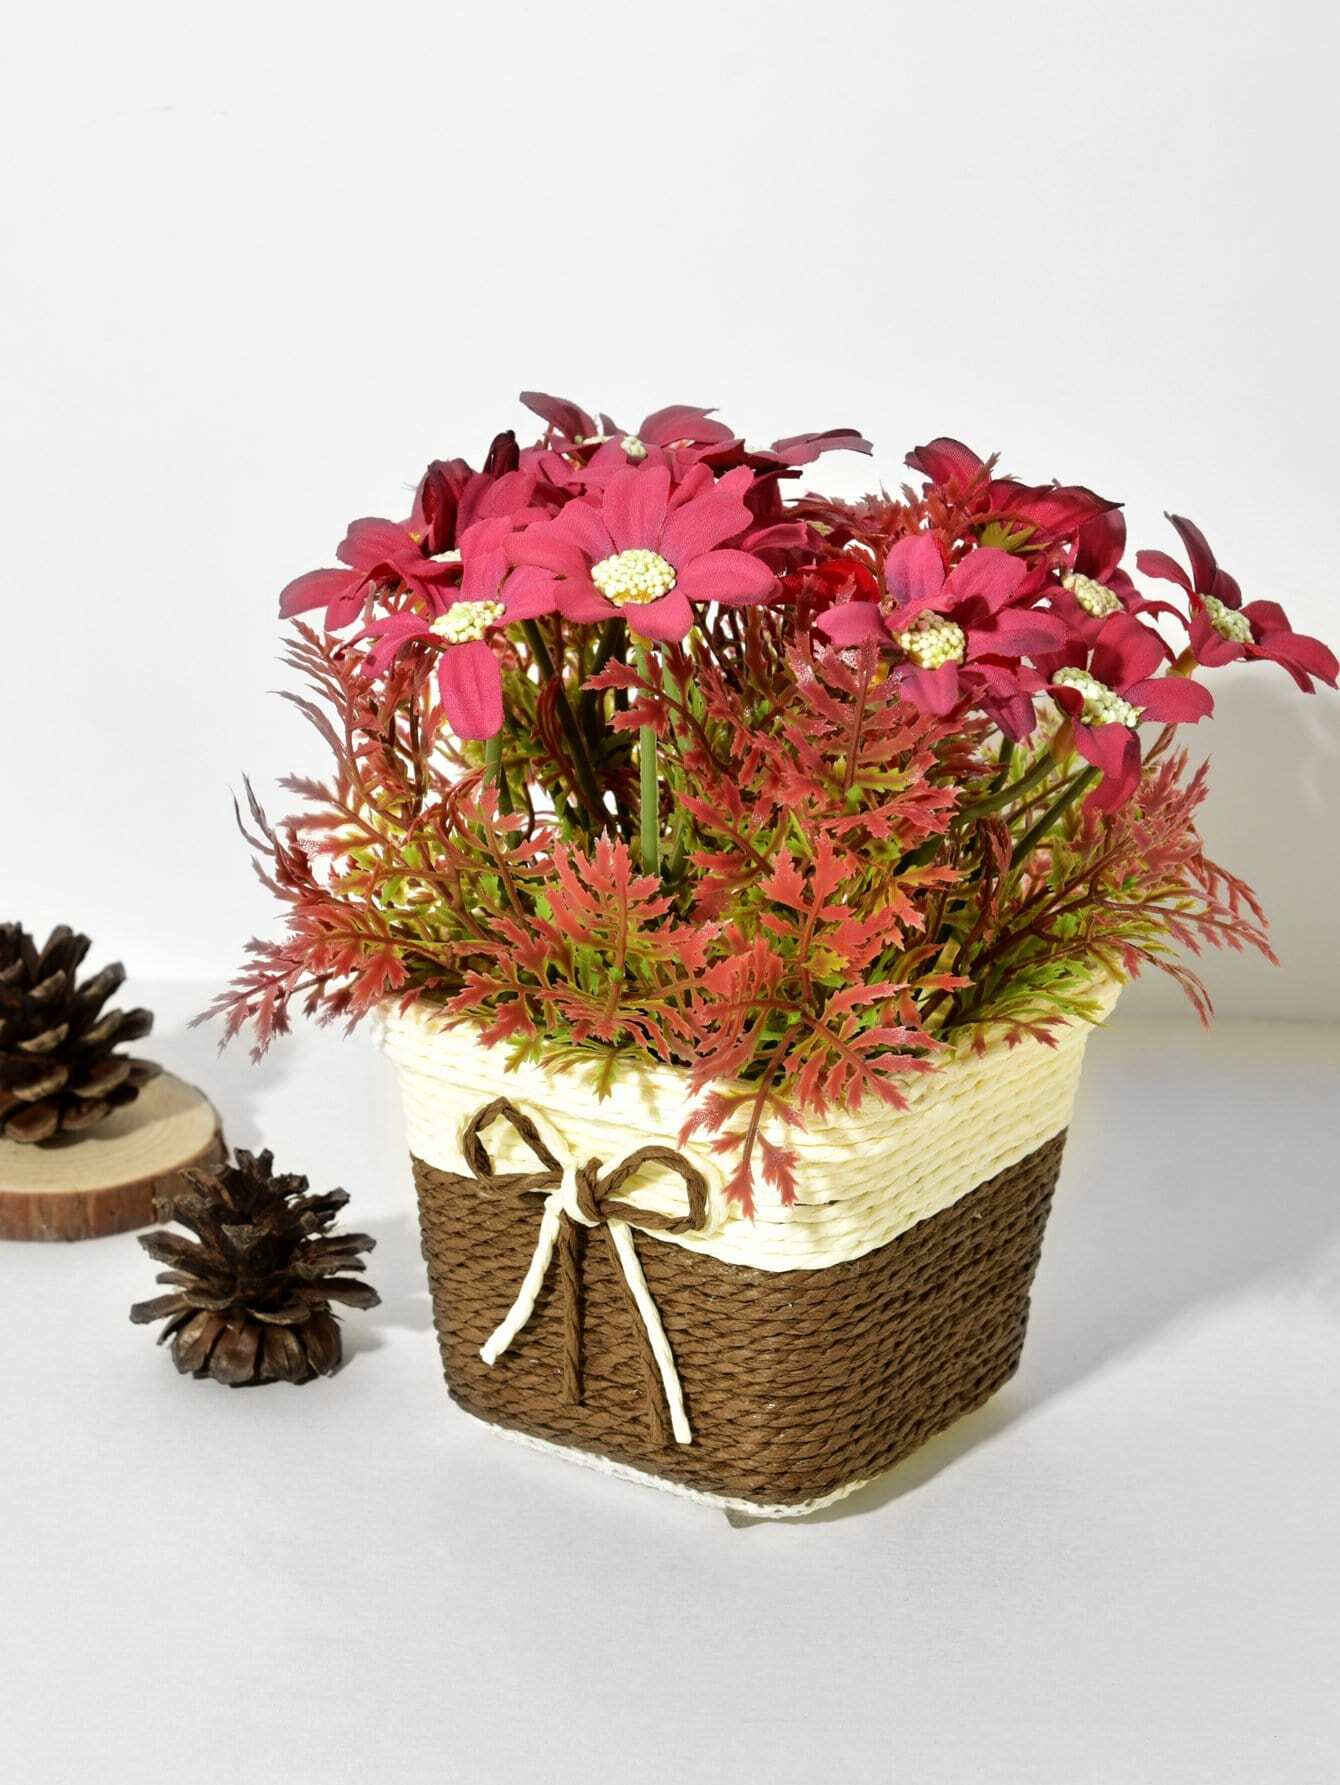 Artificial Flower 9pcs Branch With Rattan Pot